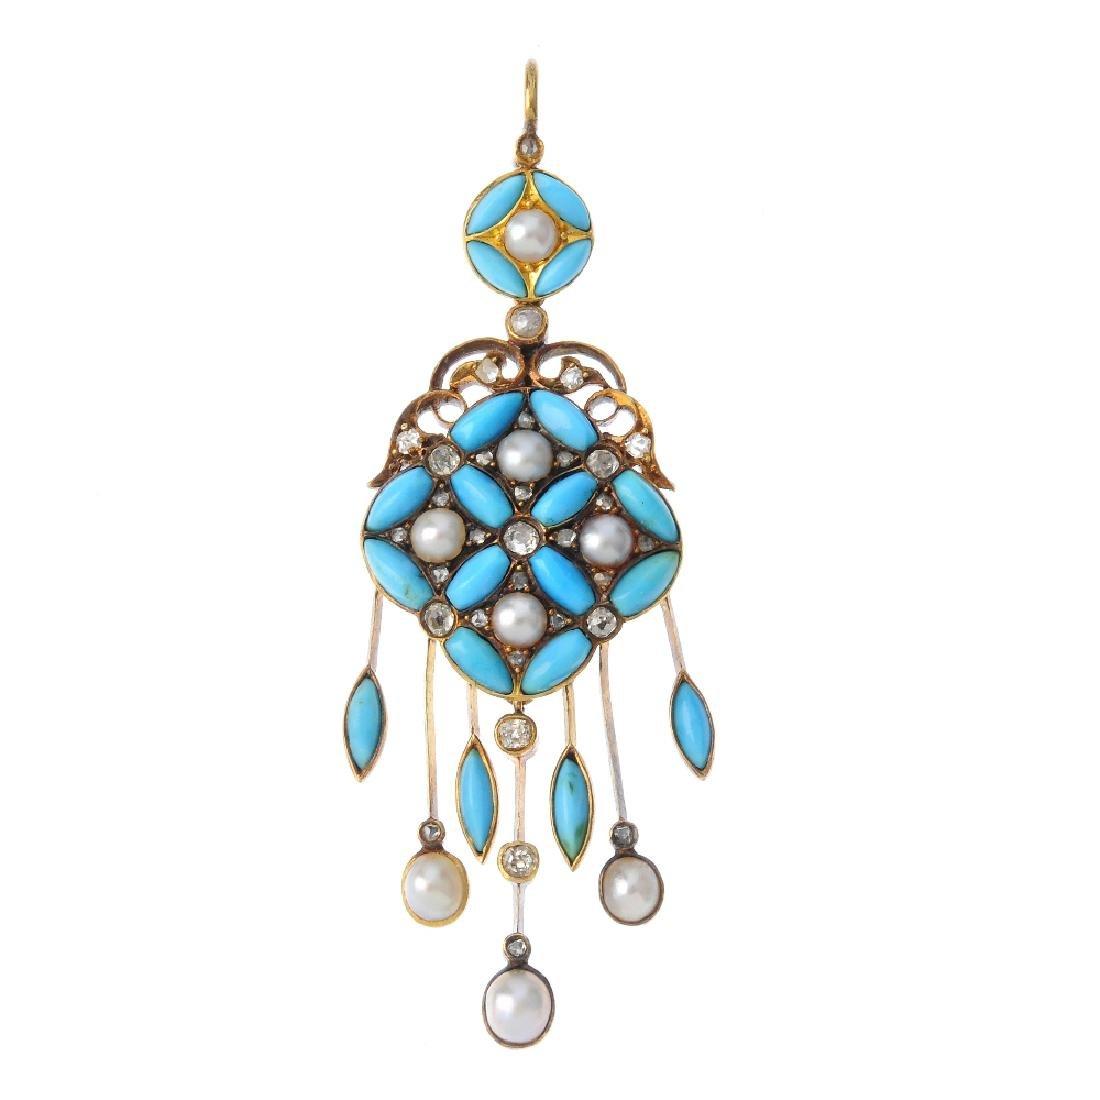 A mid Victorian gold, diamond and gem-set pendant,